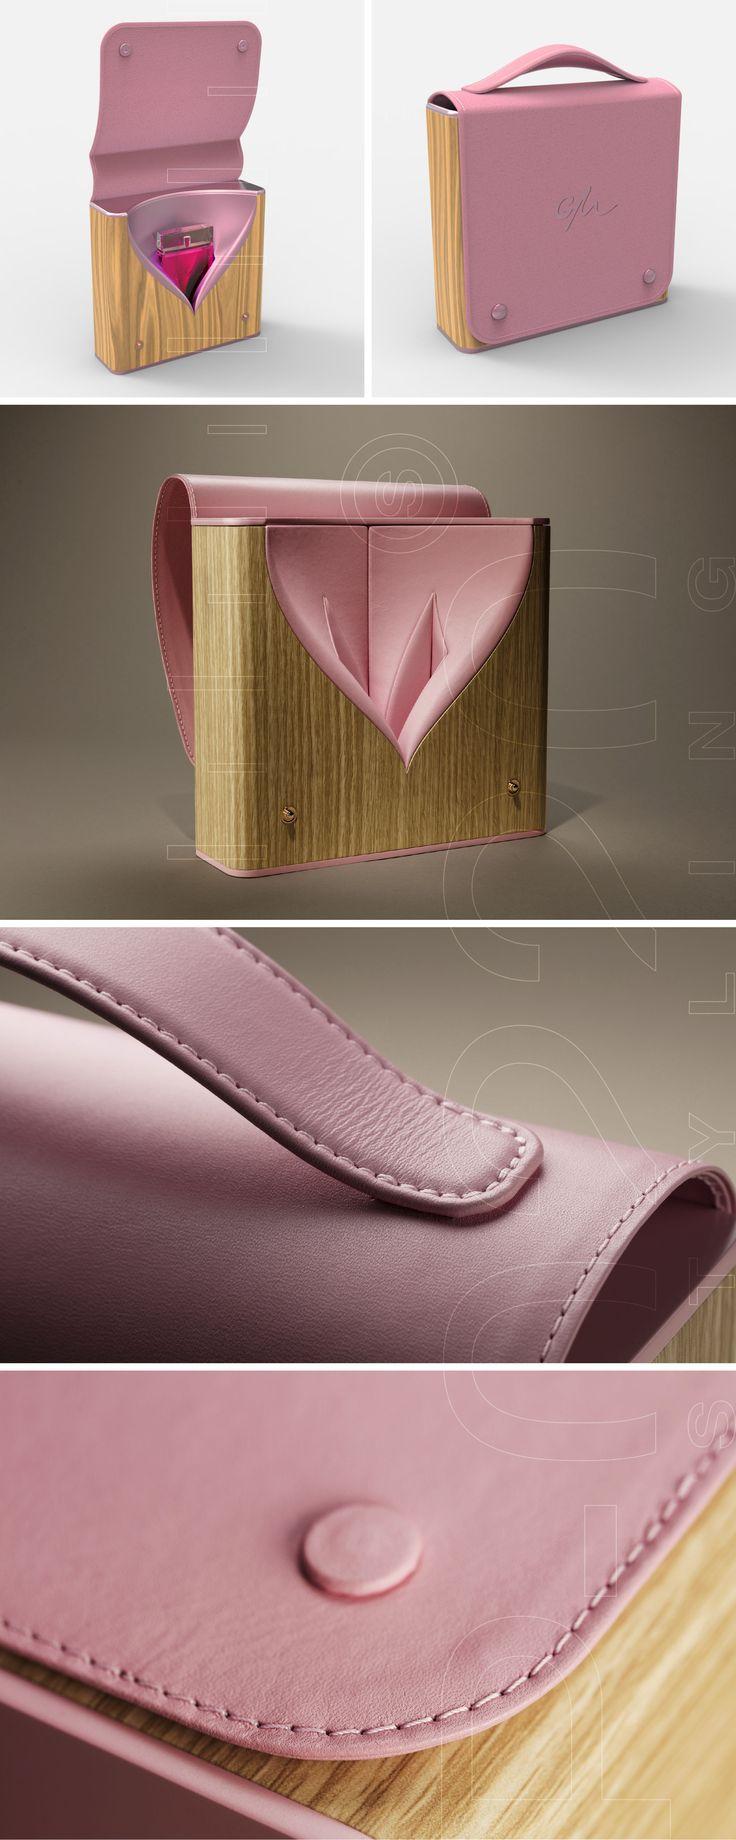 100% PACKAGING & DESIGN SA | Écrin Parfum / Perfume Box designed by Pozzo di Borgo Styling. Fabriqué par / Made by RS Agencement Steiner, Gainerie Moderne, Huguenin-Sandoz.